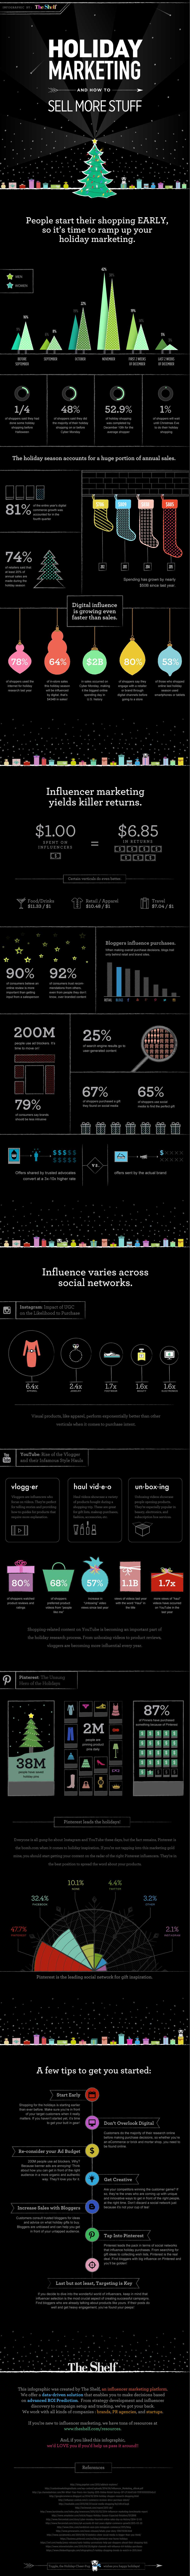 2015-12-17holiday-marketing-2015-infographic-the-shelf